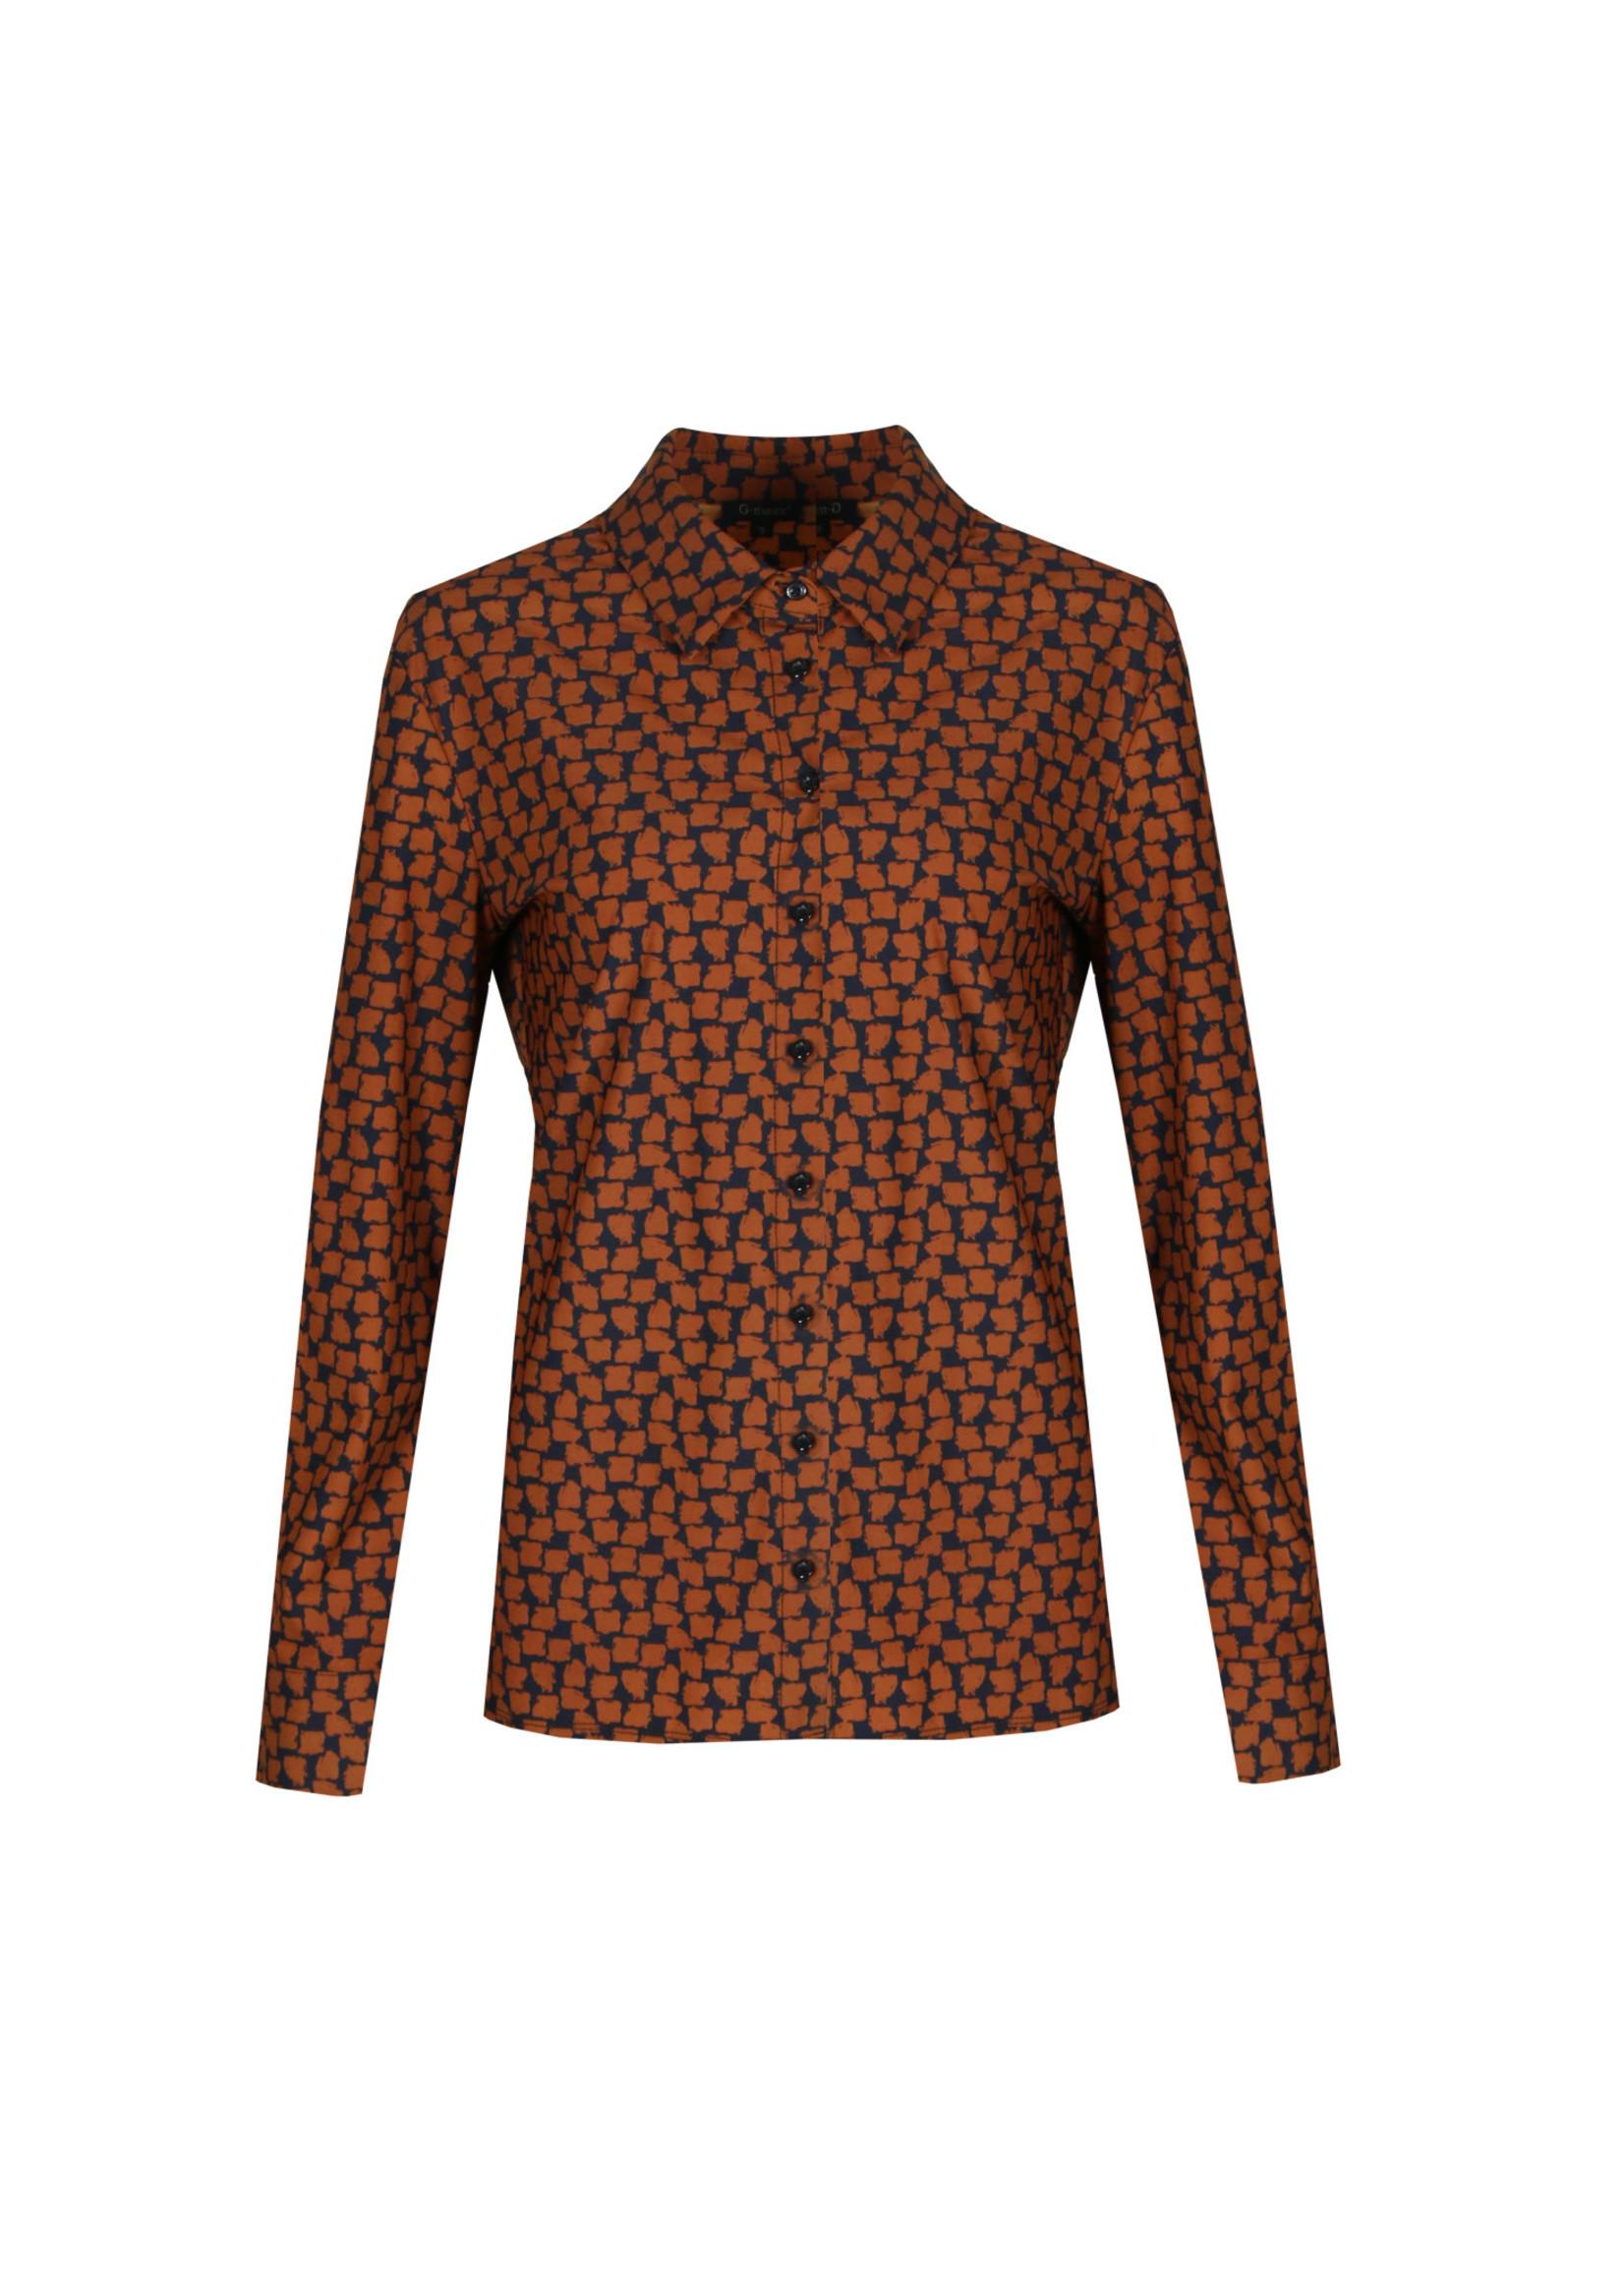 G-Maxx G-maxx - Amalia blouse - Zwart/cognac